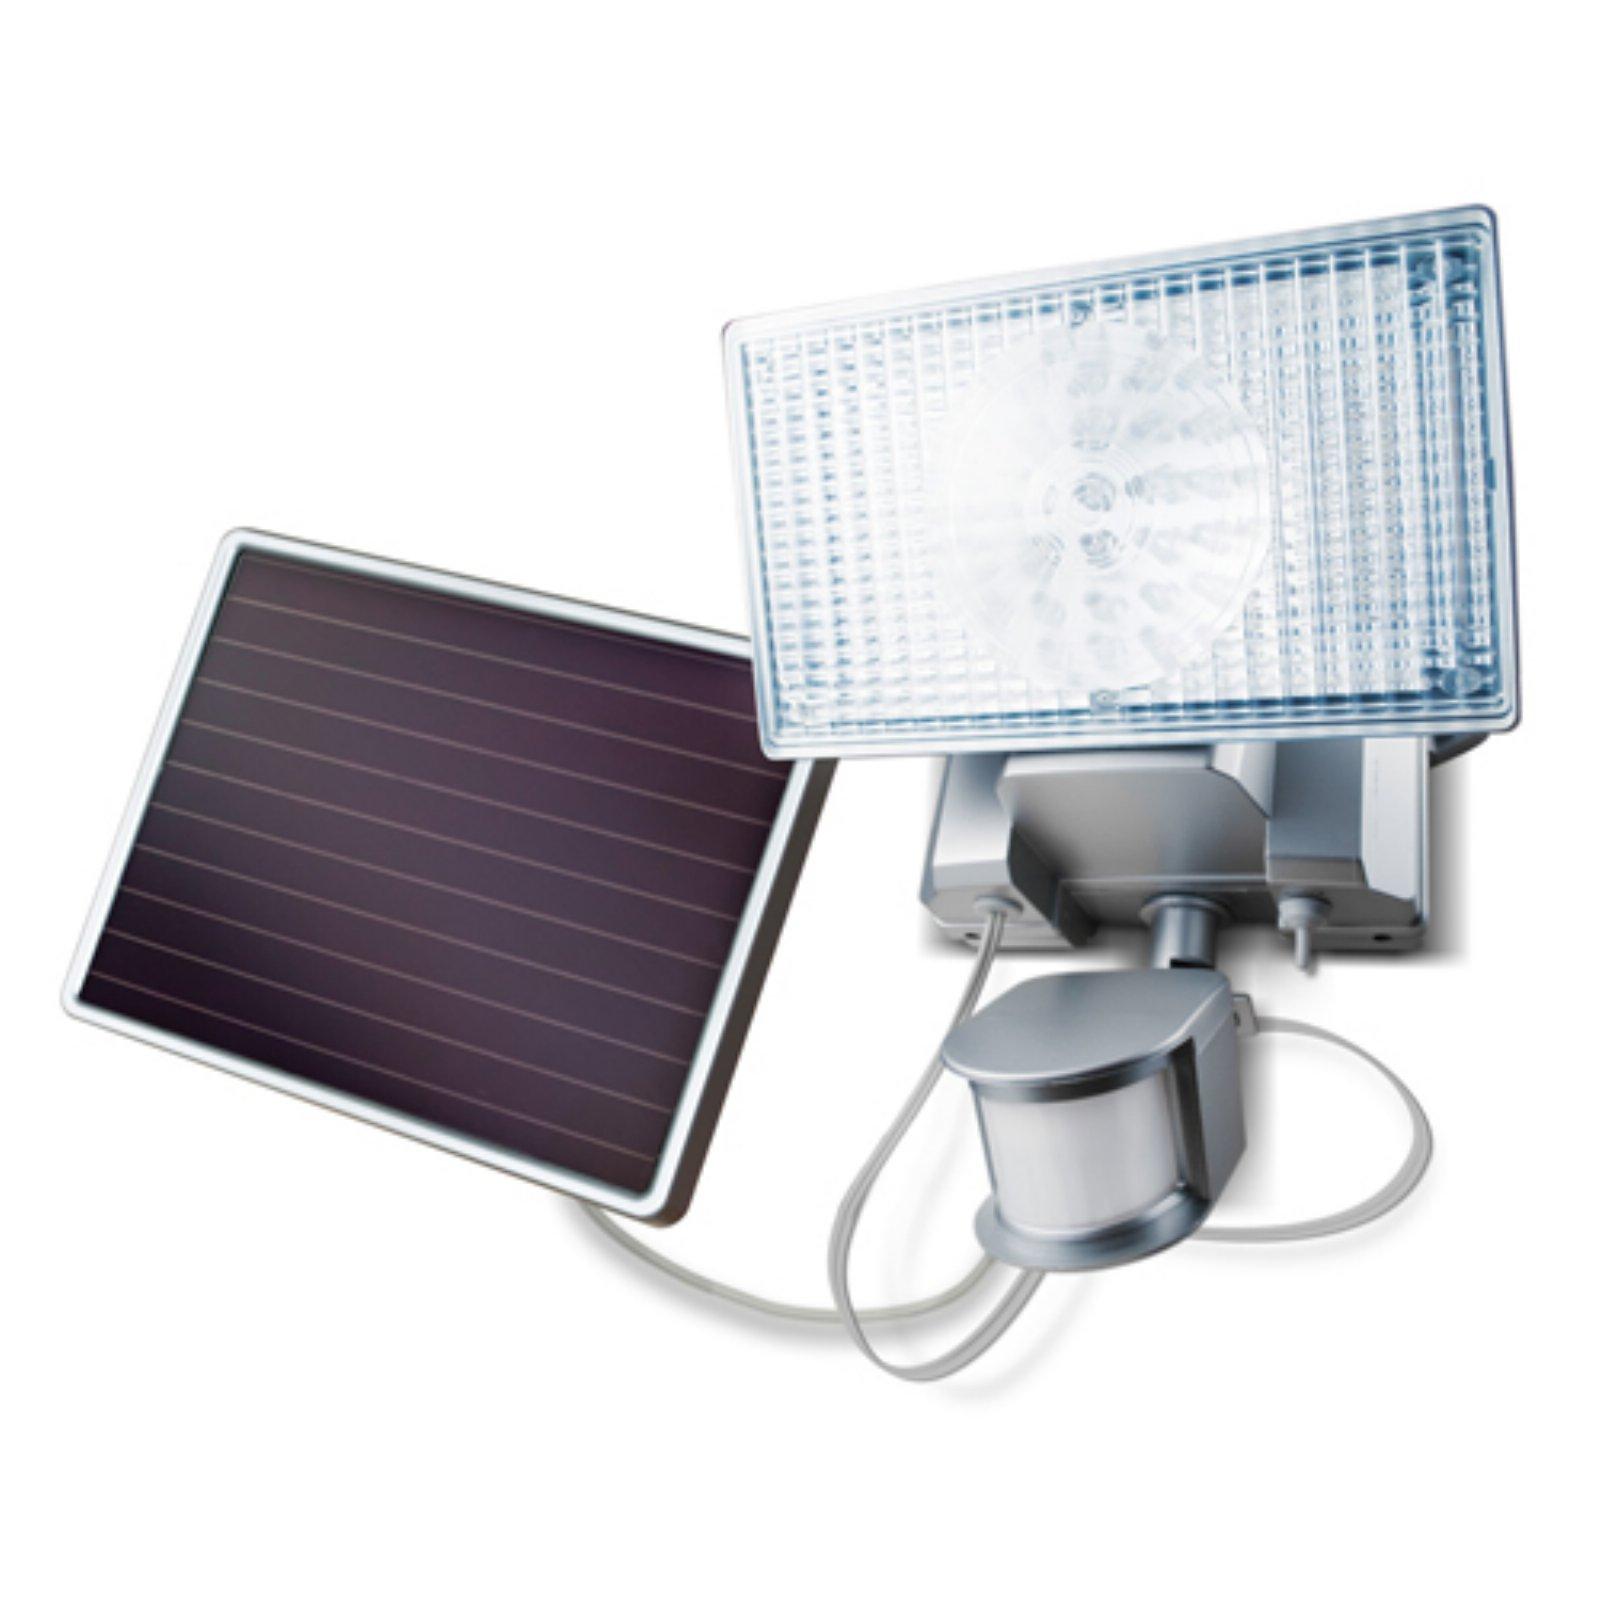 Maxsa Innovations 44449 100 LED Outdoor Solar Security Light